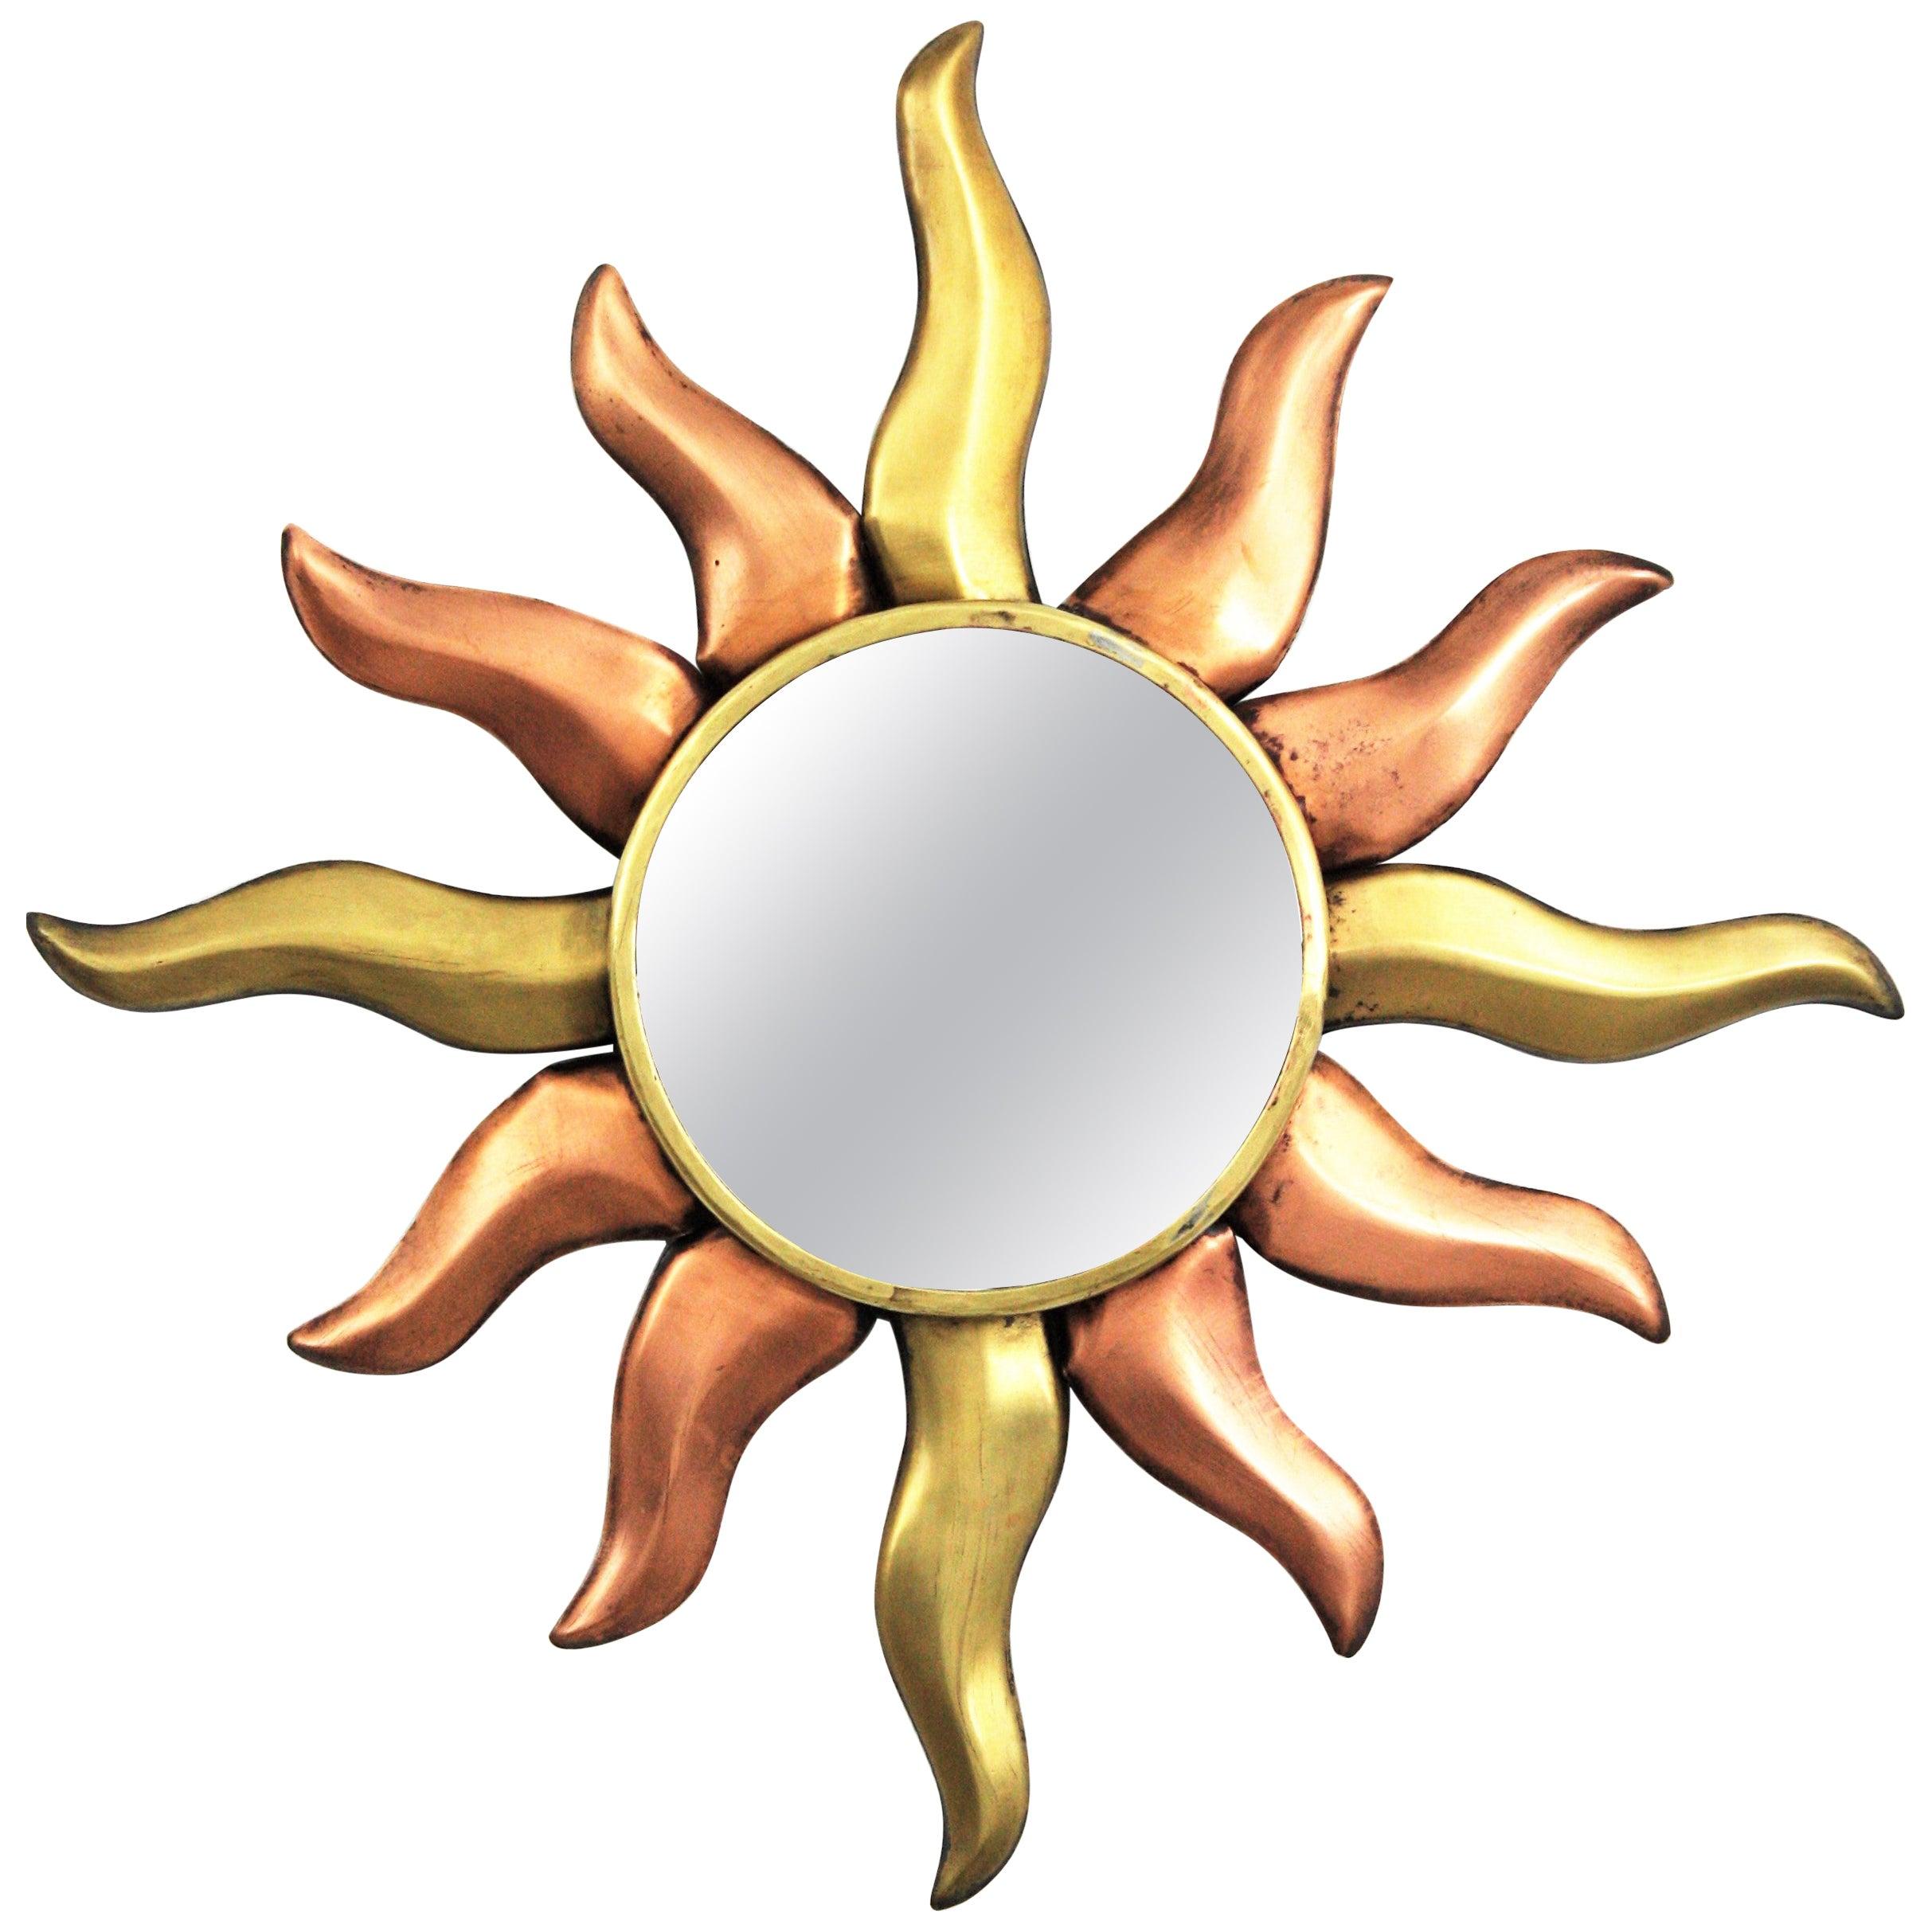 Sunburst French Mirror in Copper and Brass